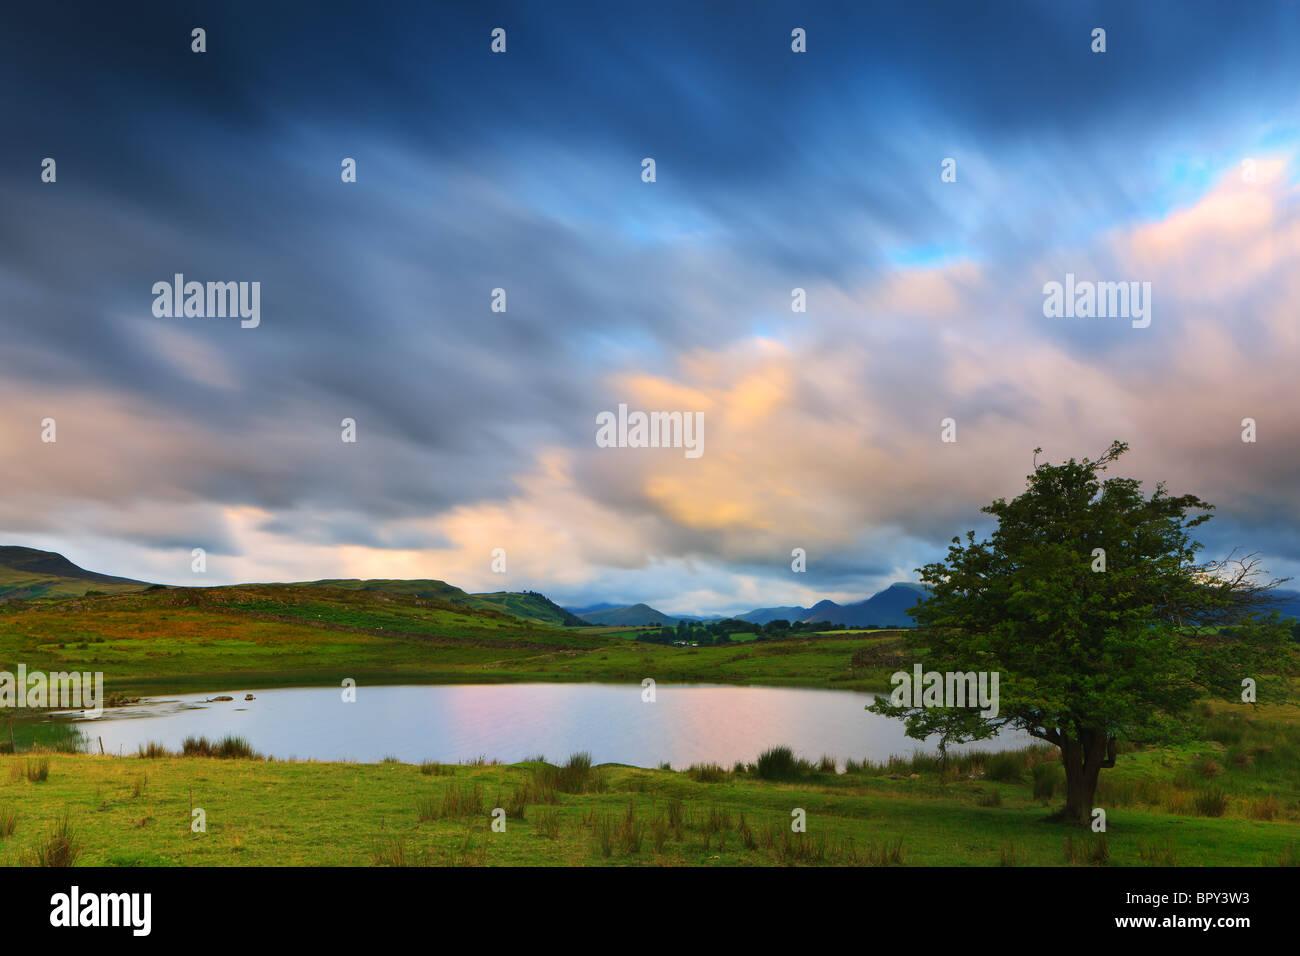 Tewit Tarn at sunrise near Keswick, Lake District, Cumbria, England. - Stock Image